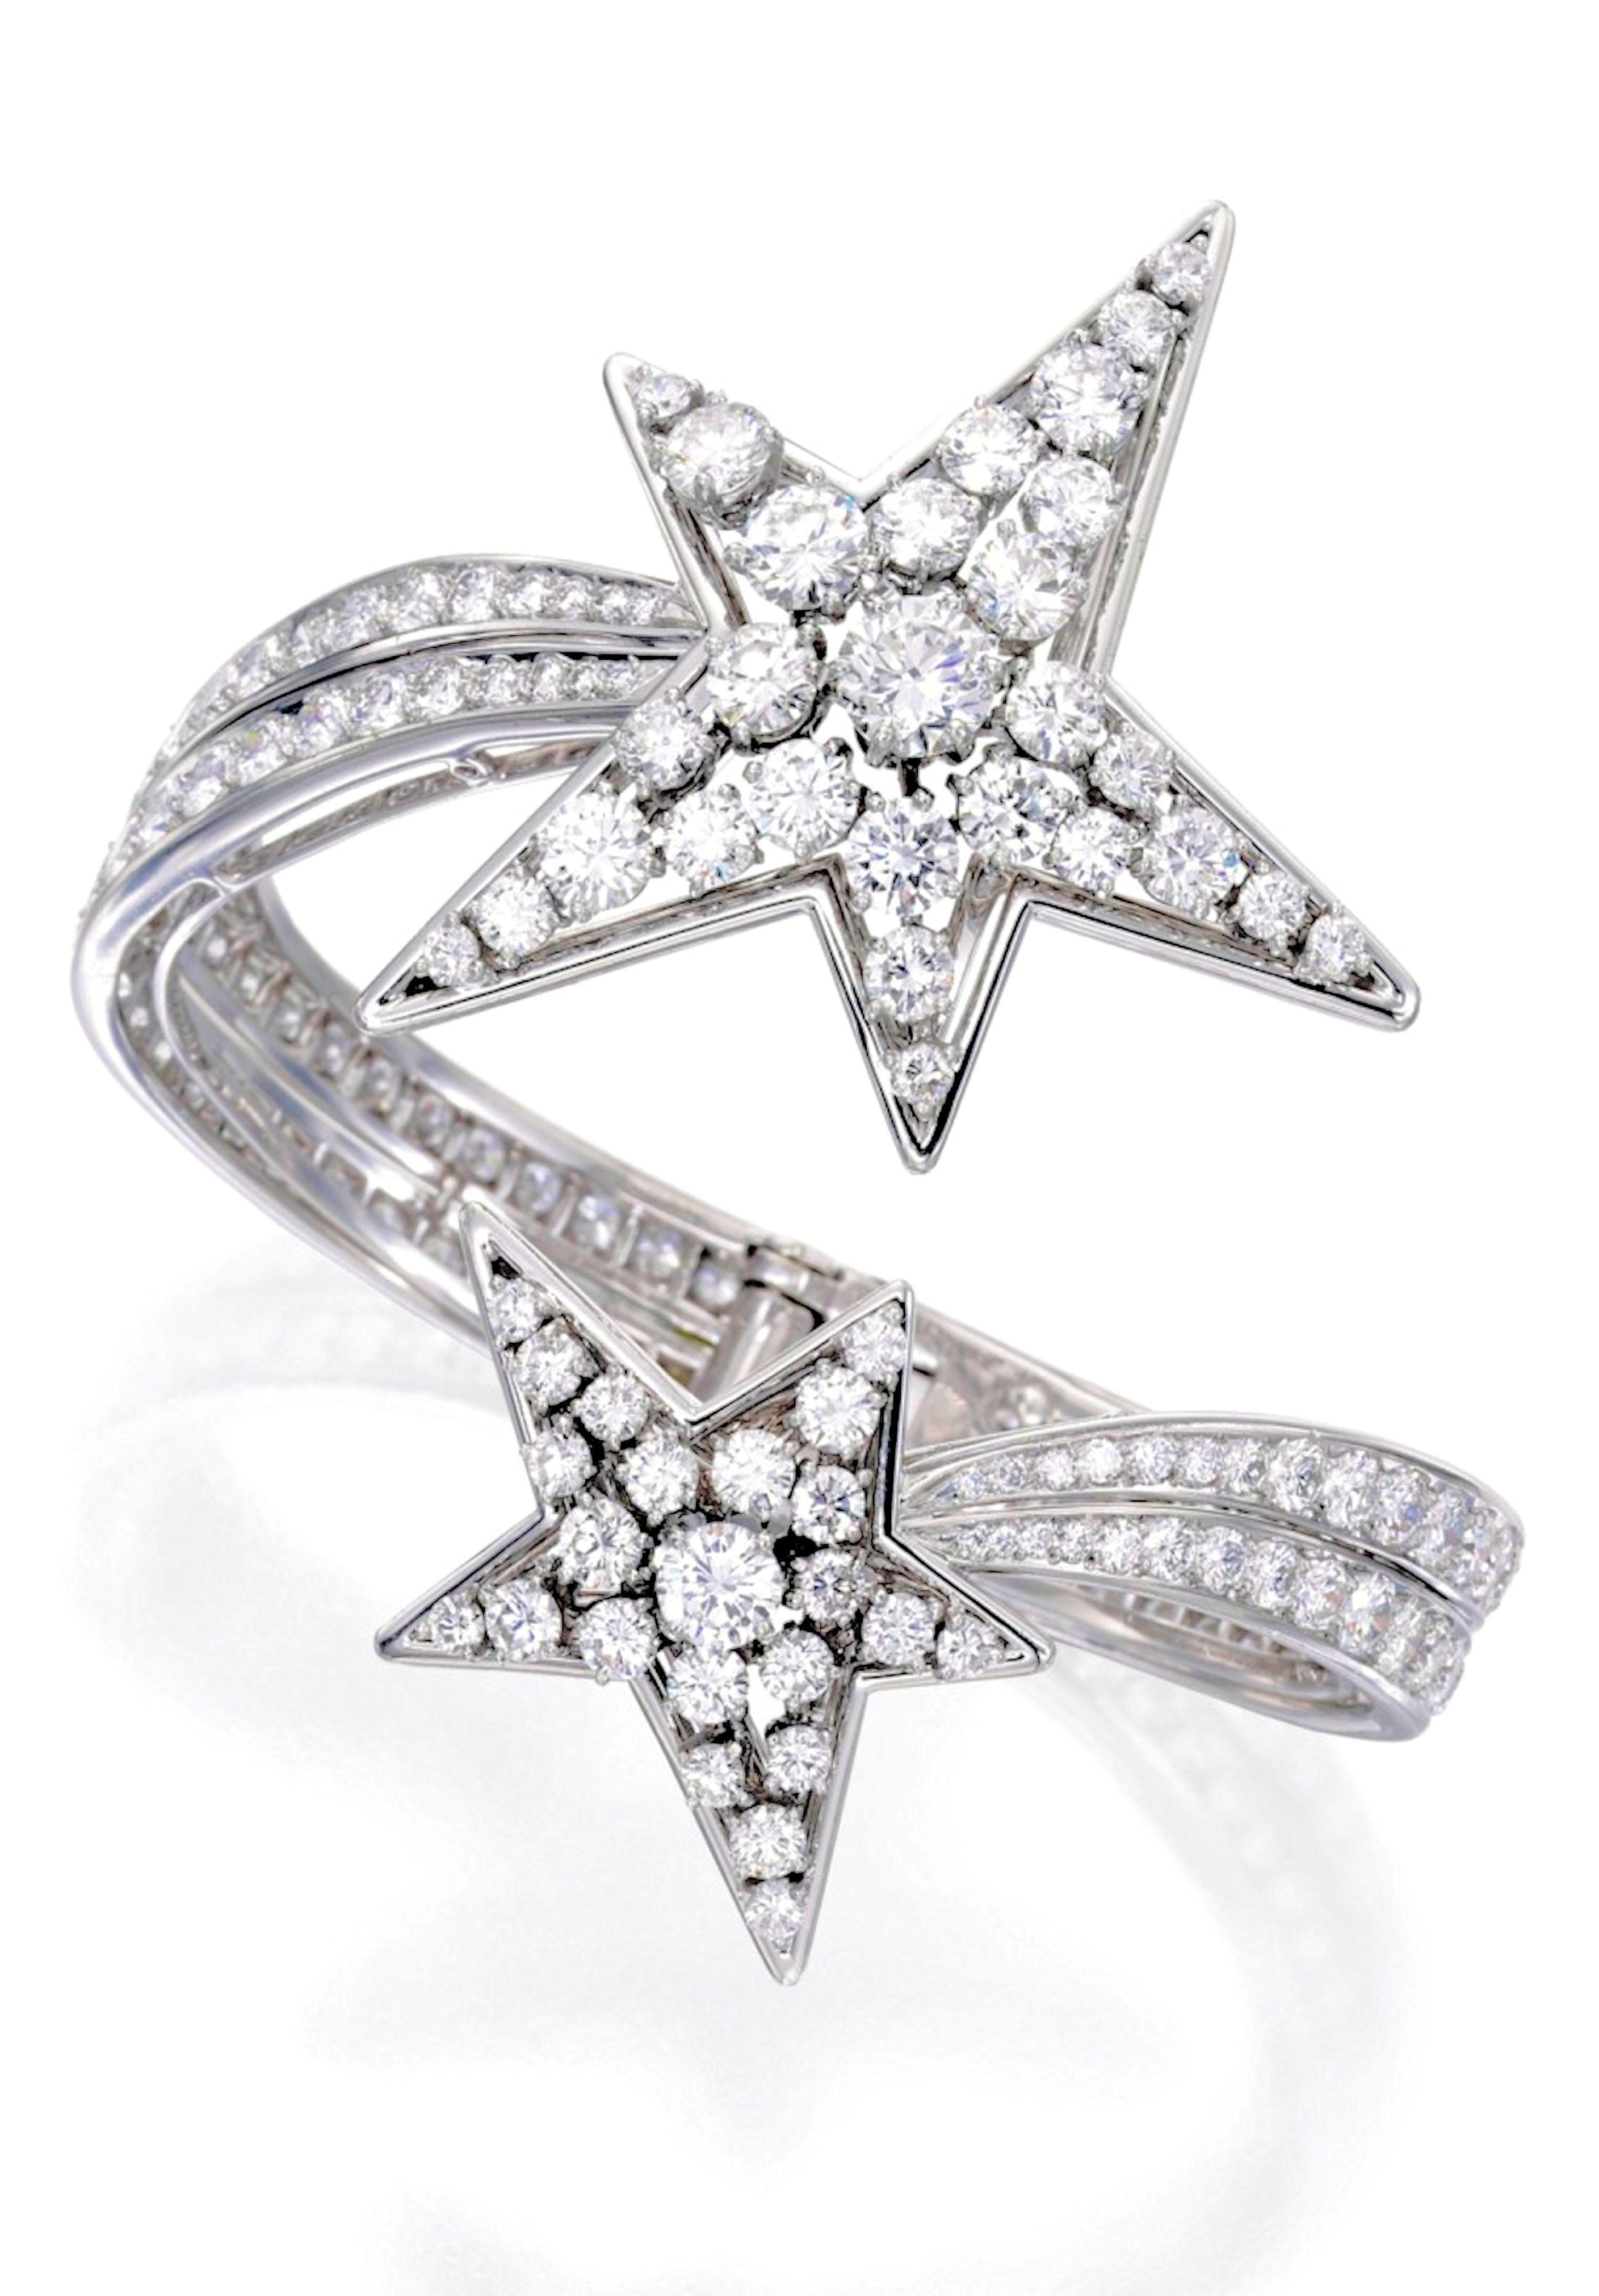 Chanel Star Bracelet